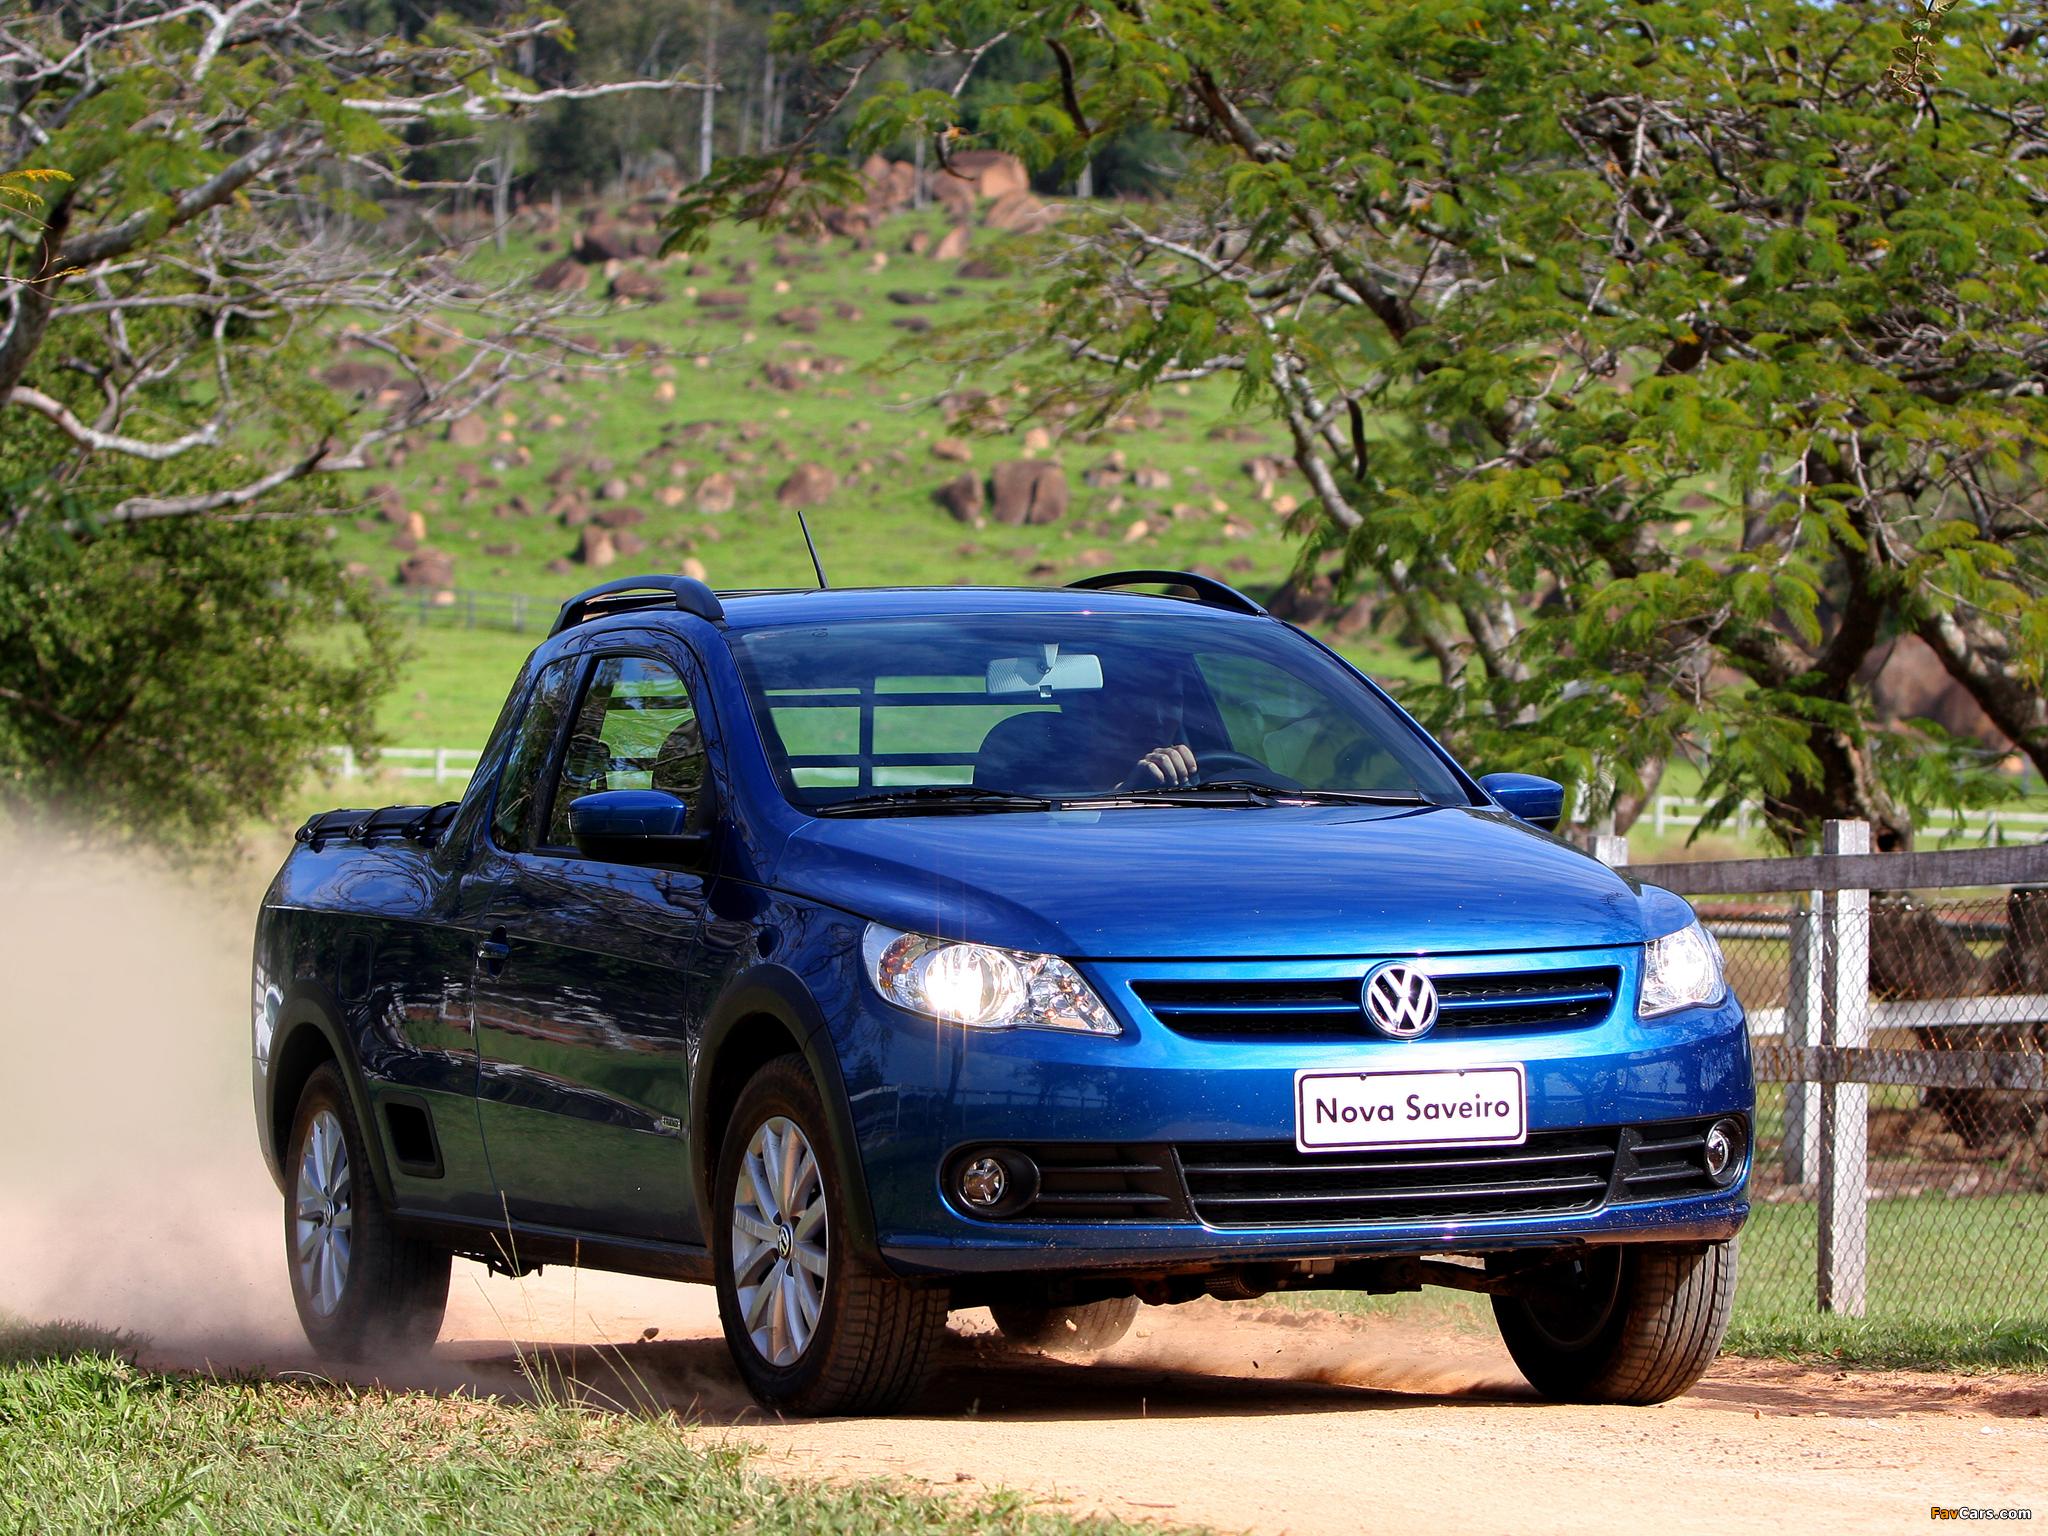 Volkswagen Saveiro Trend Cabine Estendida (V) 2009 pictures (2048 x 1536)